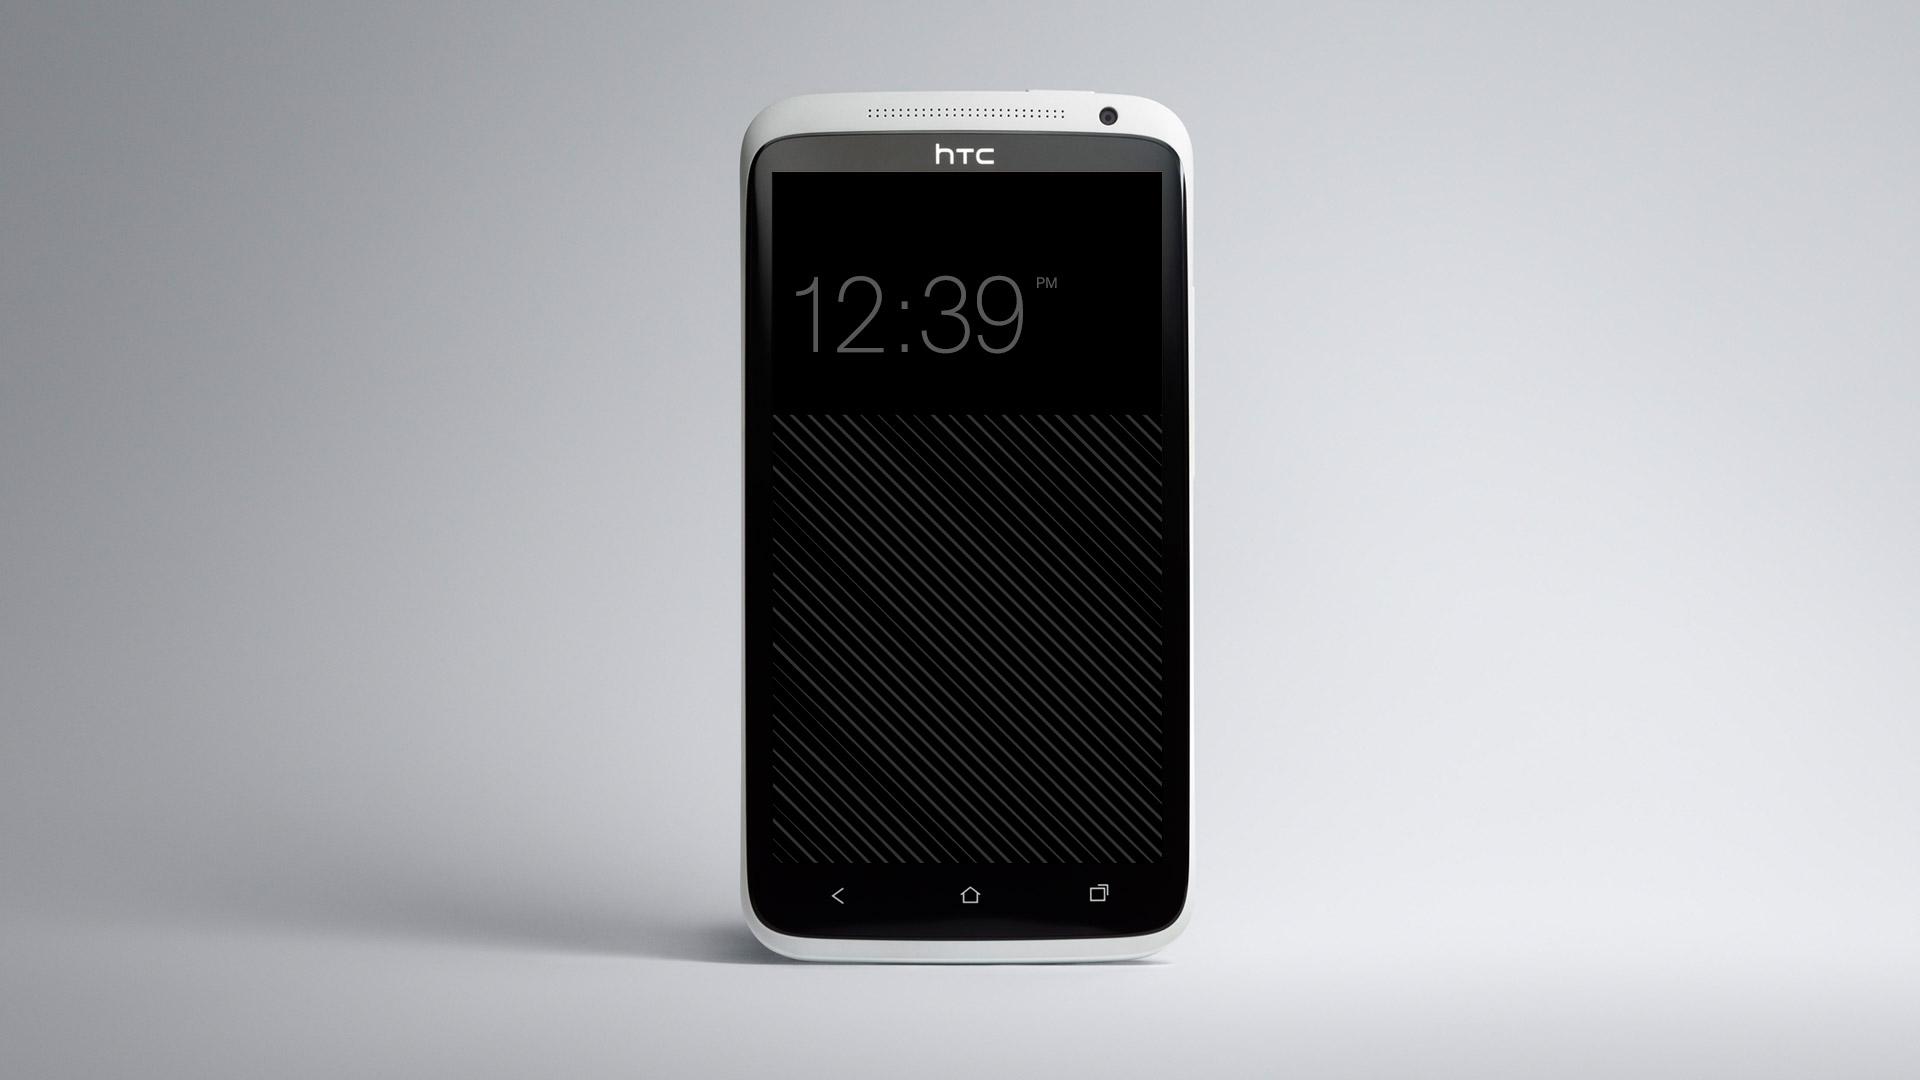 HTC_test.jpg